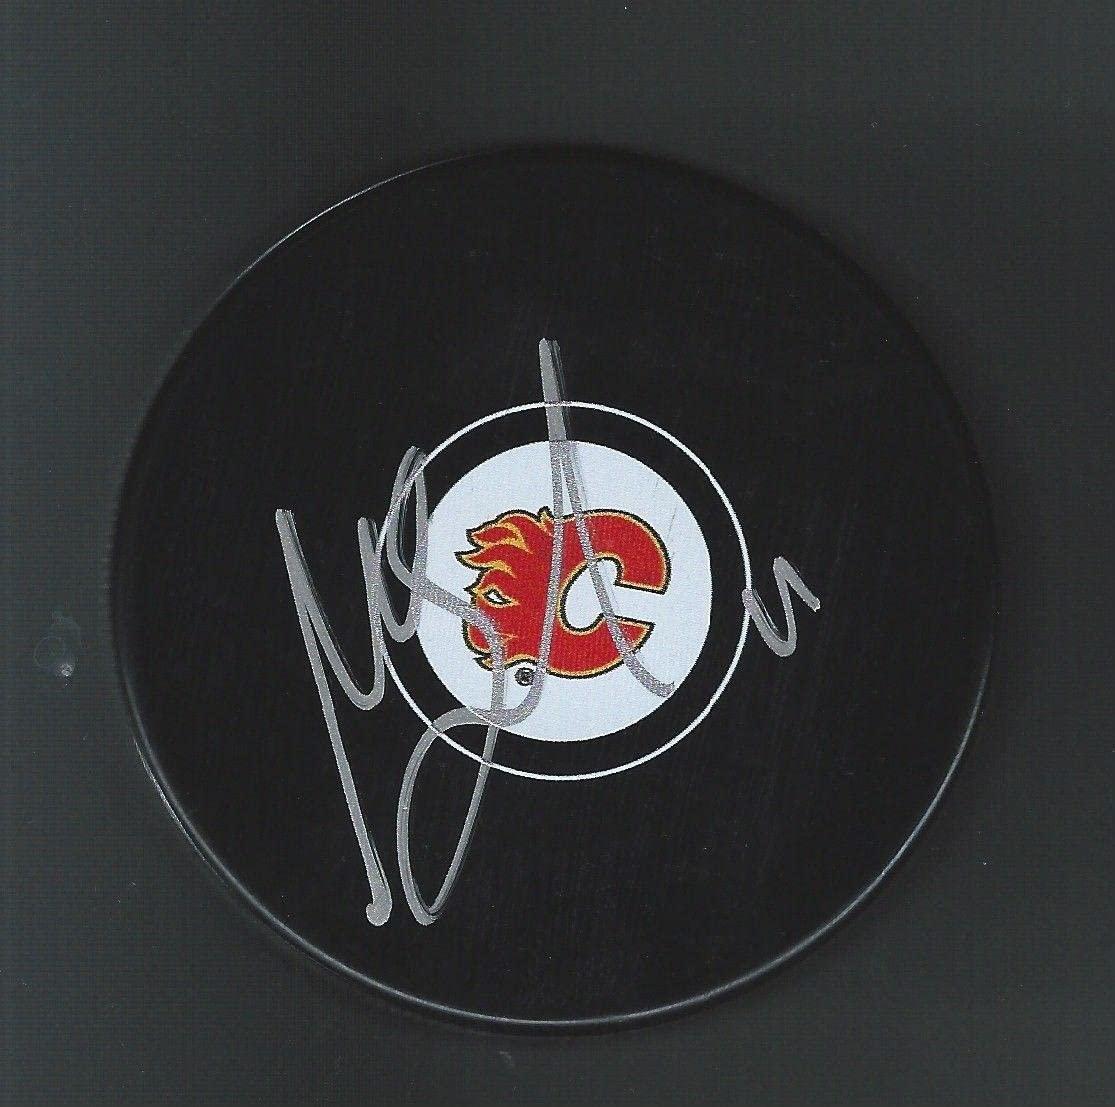 Mikael Backlund Autographed Puck - Autographed NHL Pucks